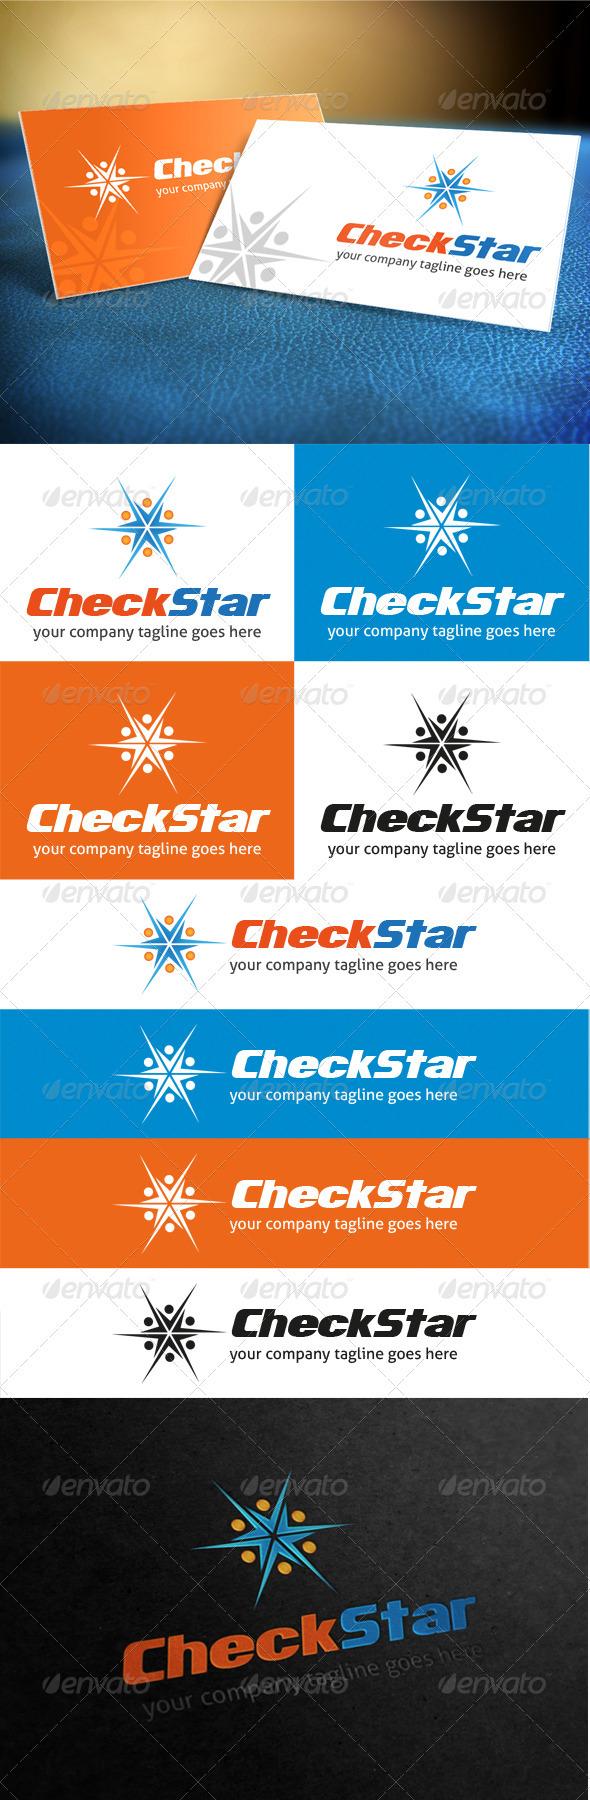 Check Star Logo